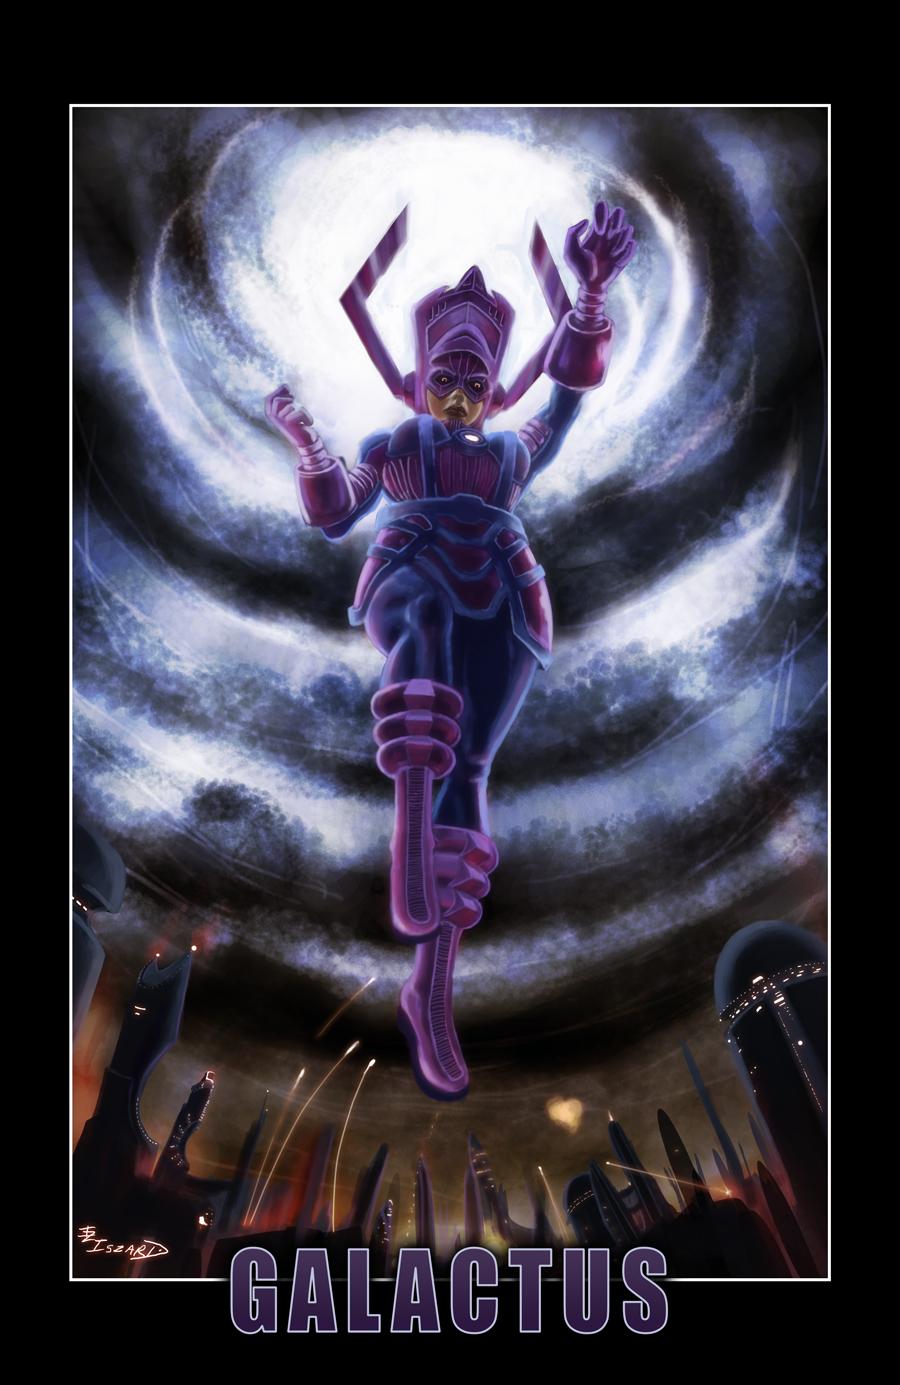 Lady Galactus